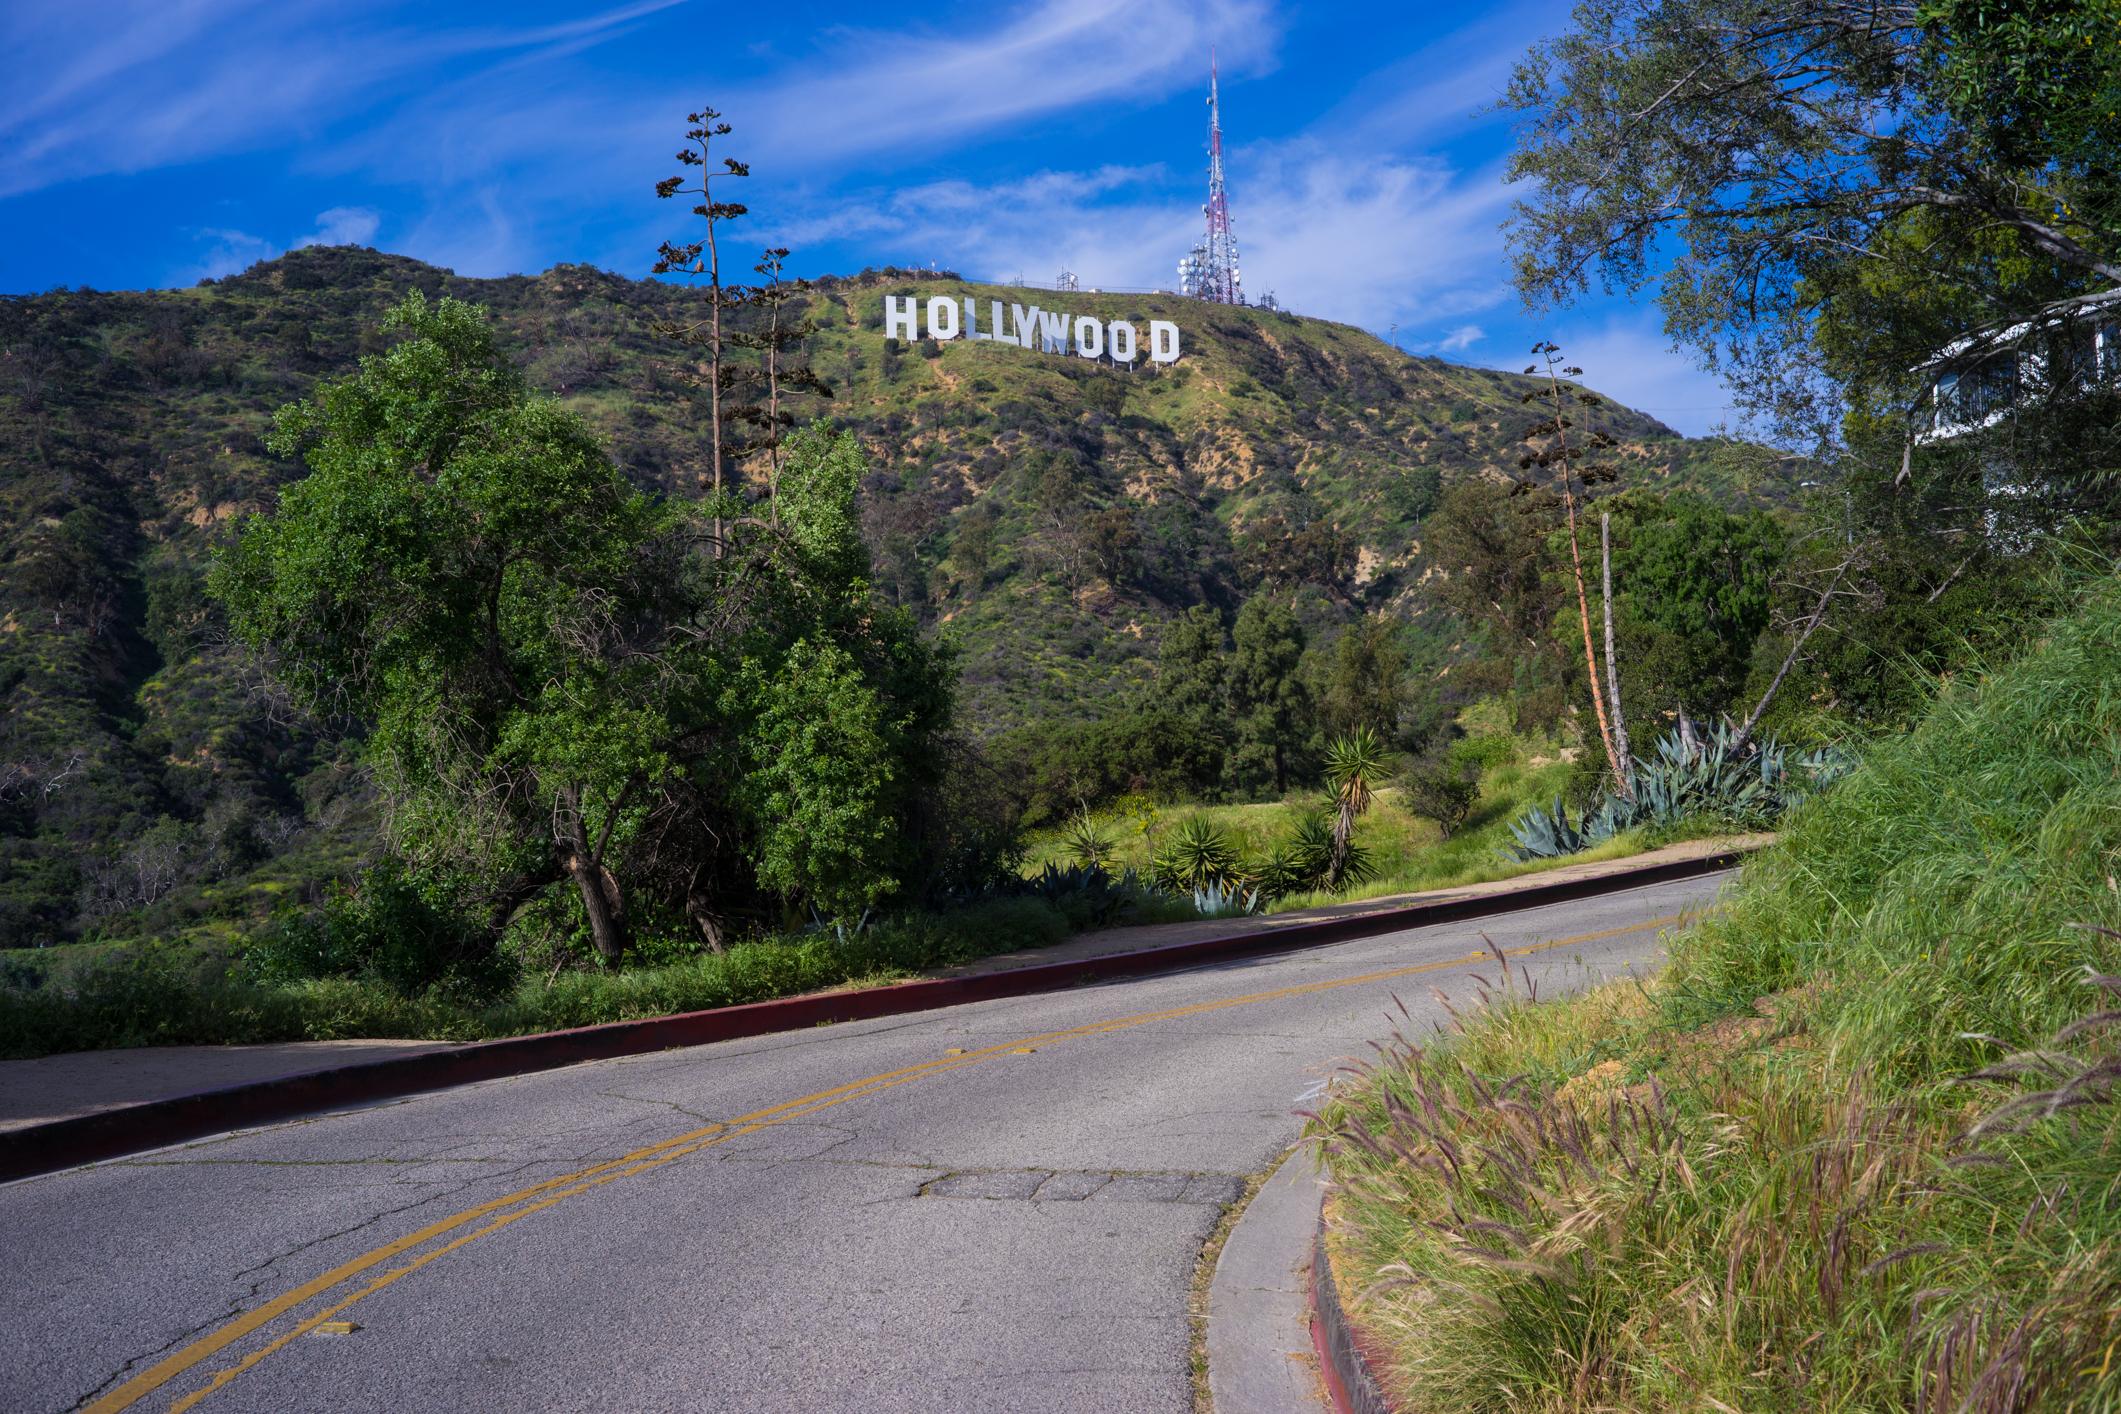 LA-Hollywood-sign-road-shot.jpg